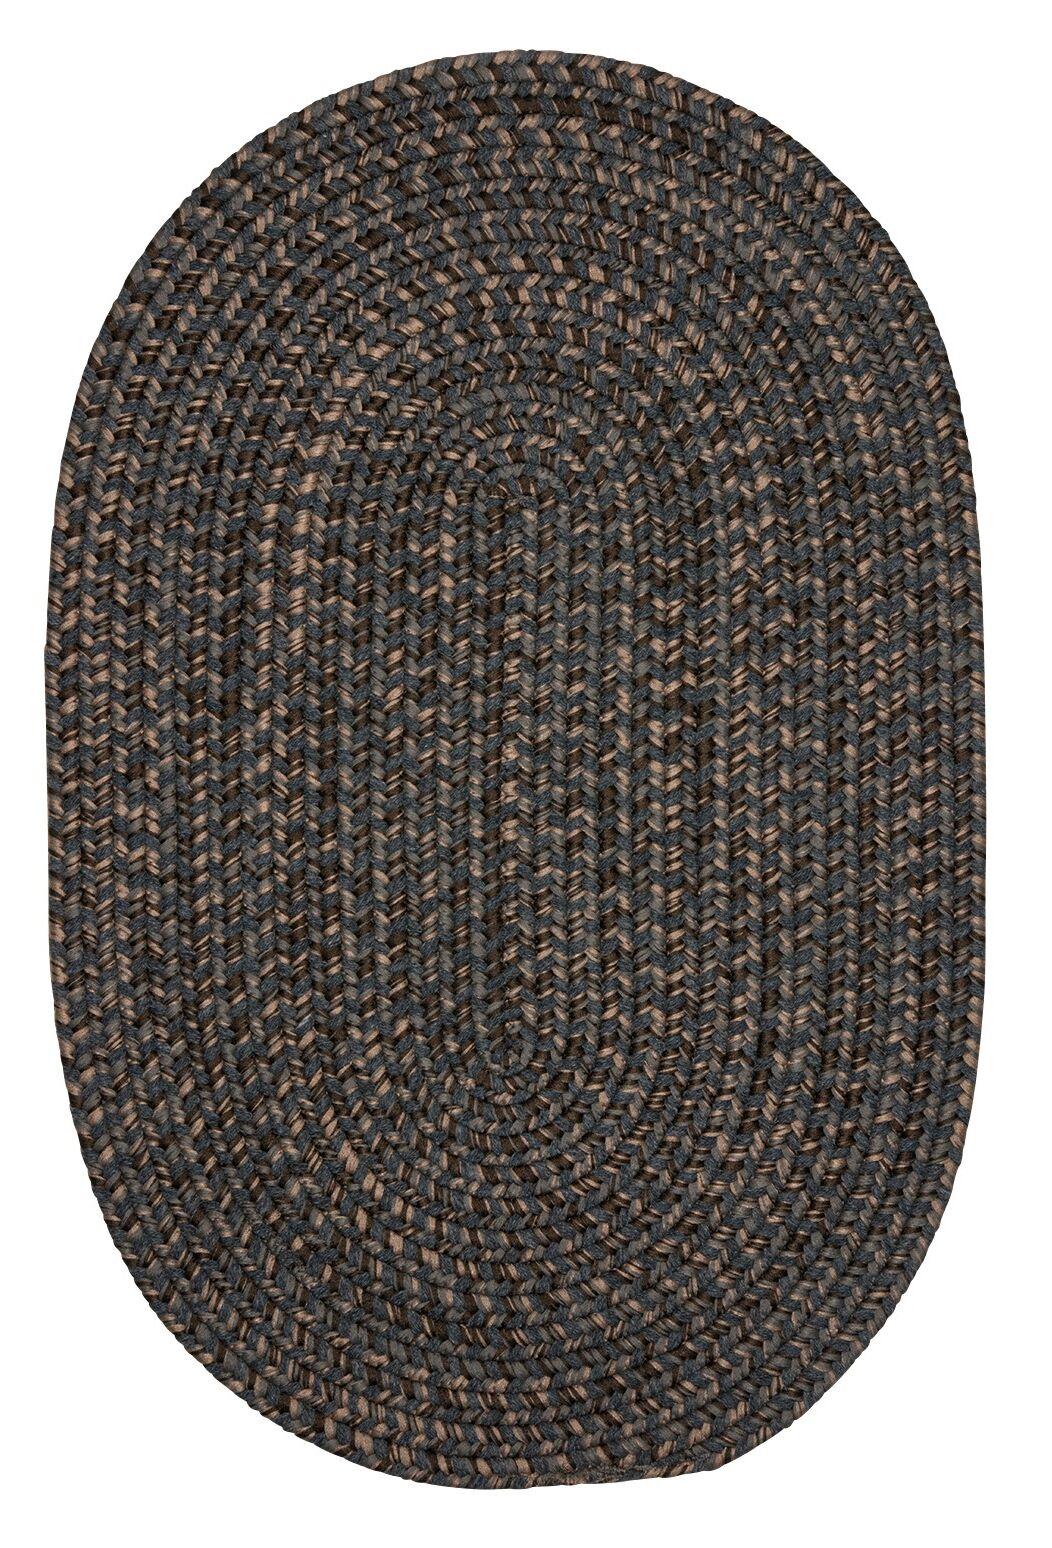 Abey Charcoal Area Rug Rug Size: Oval 2' x 4'